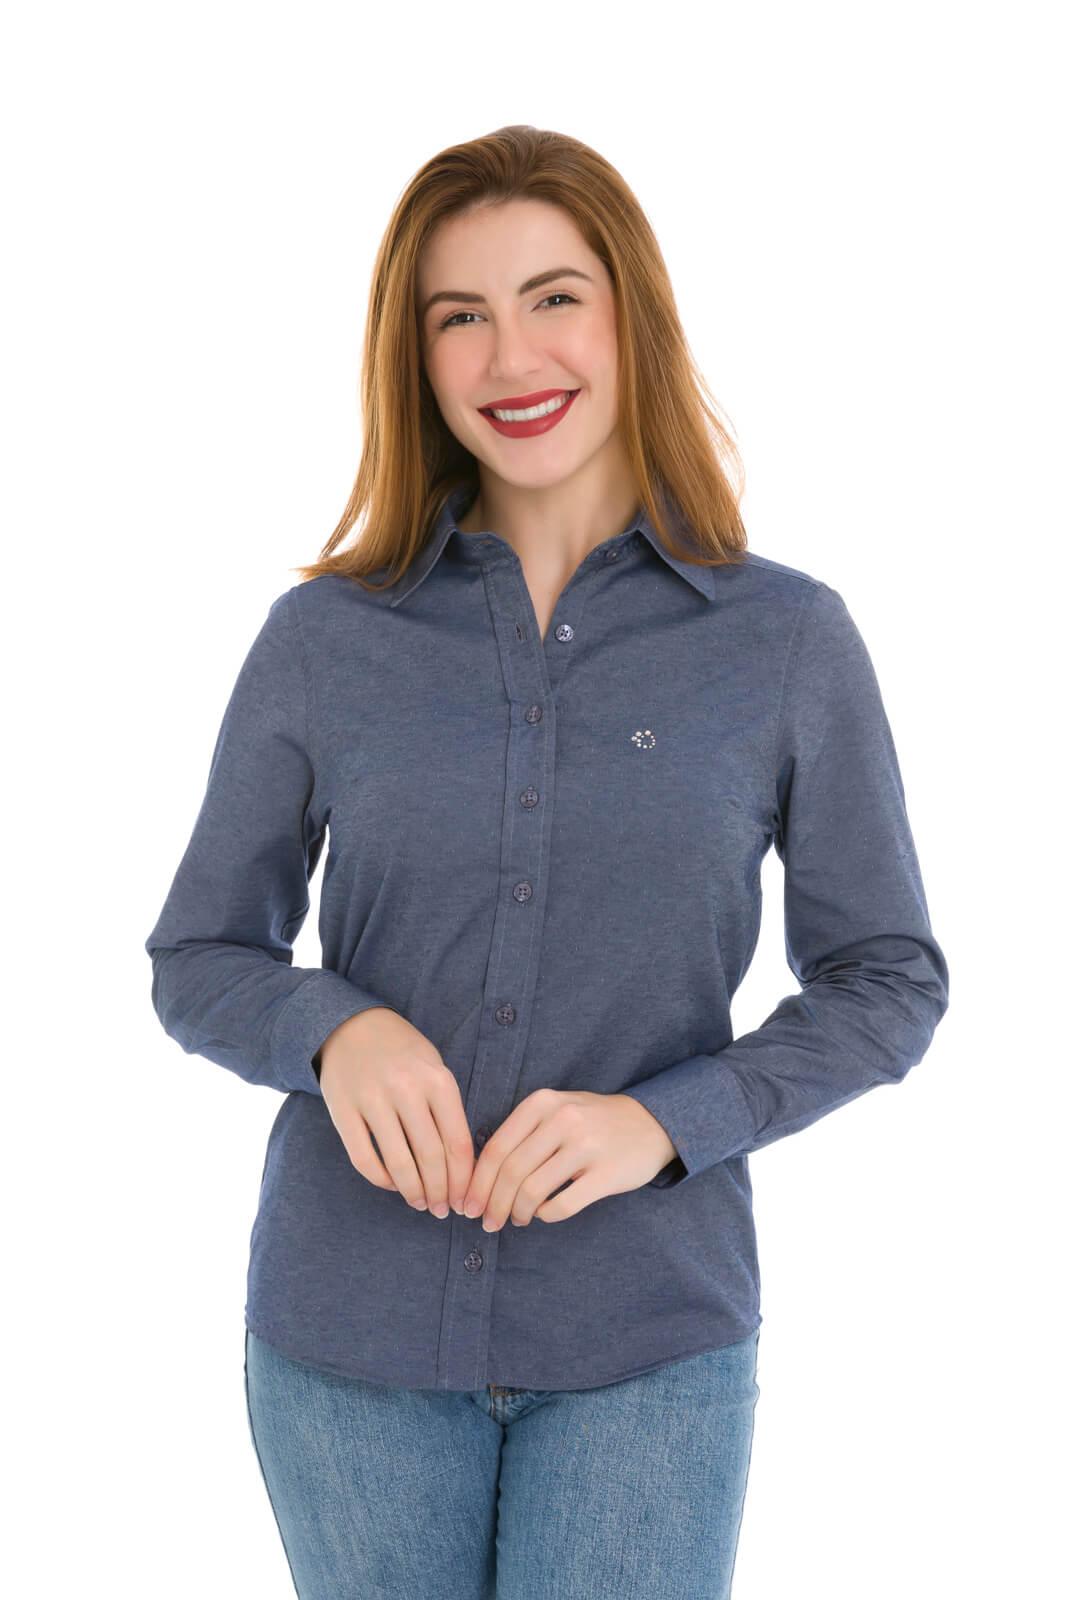 Camisa Social Feminina Olimpo Maquinetada Manga Longa Azul